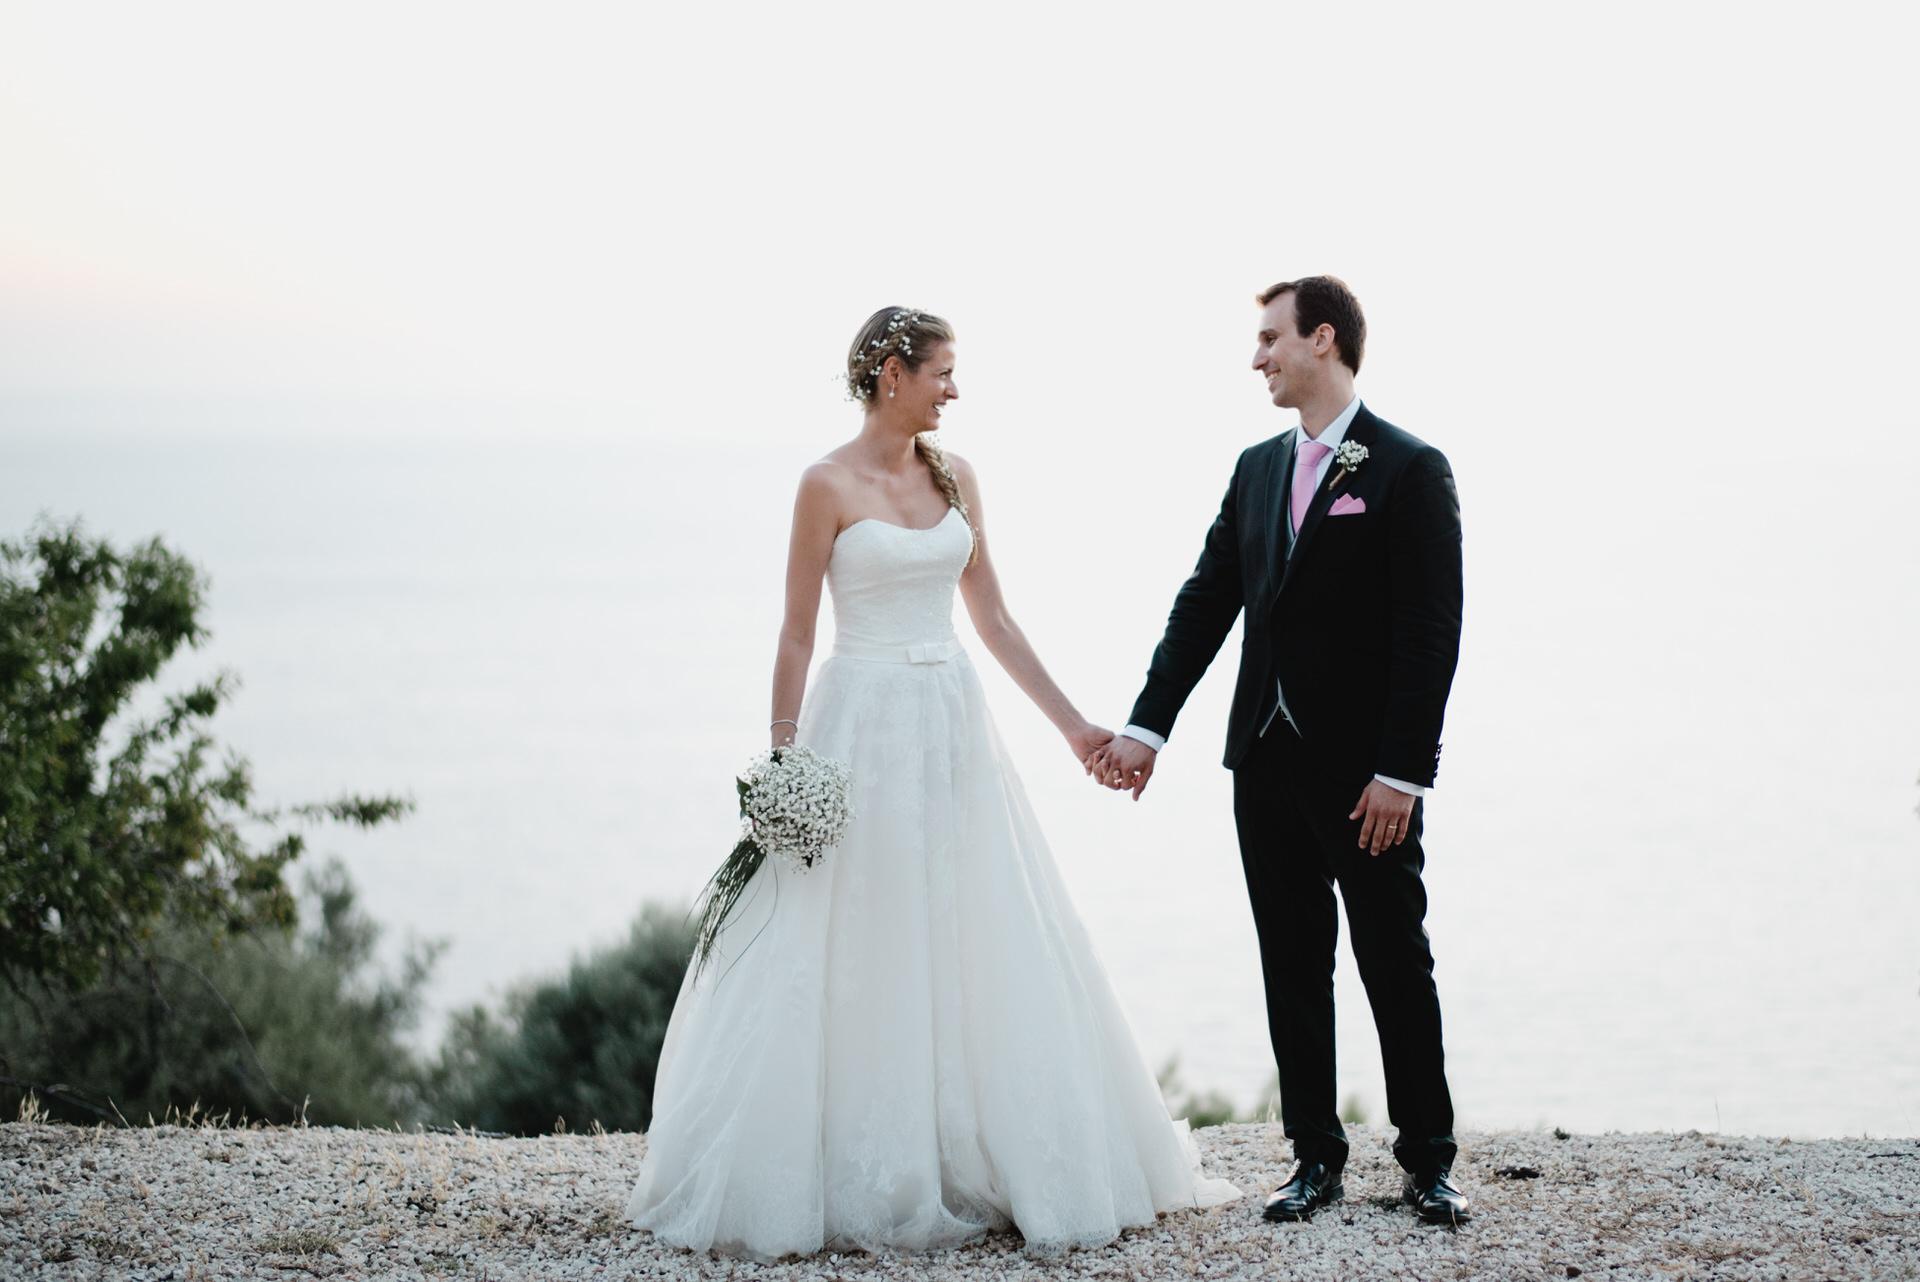 La idílica boda de Joana y Rodrigo / The idylical wedding of Joana and Rodrigo